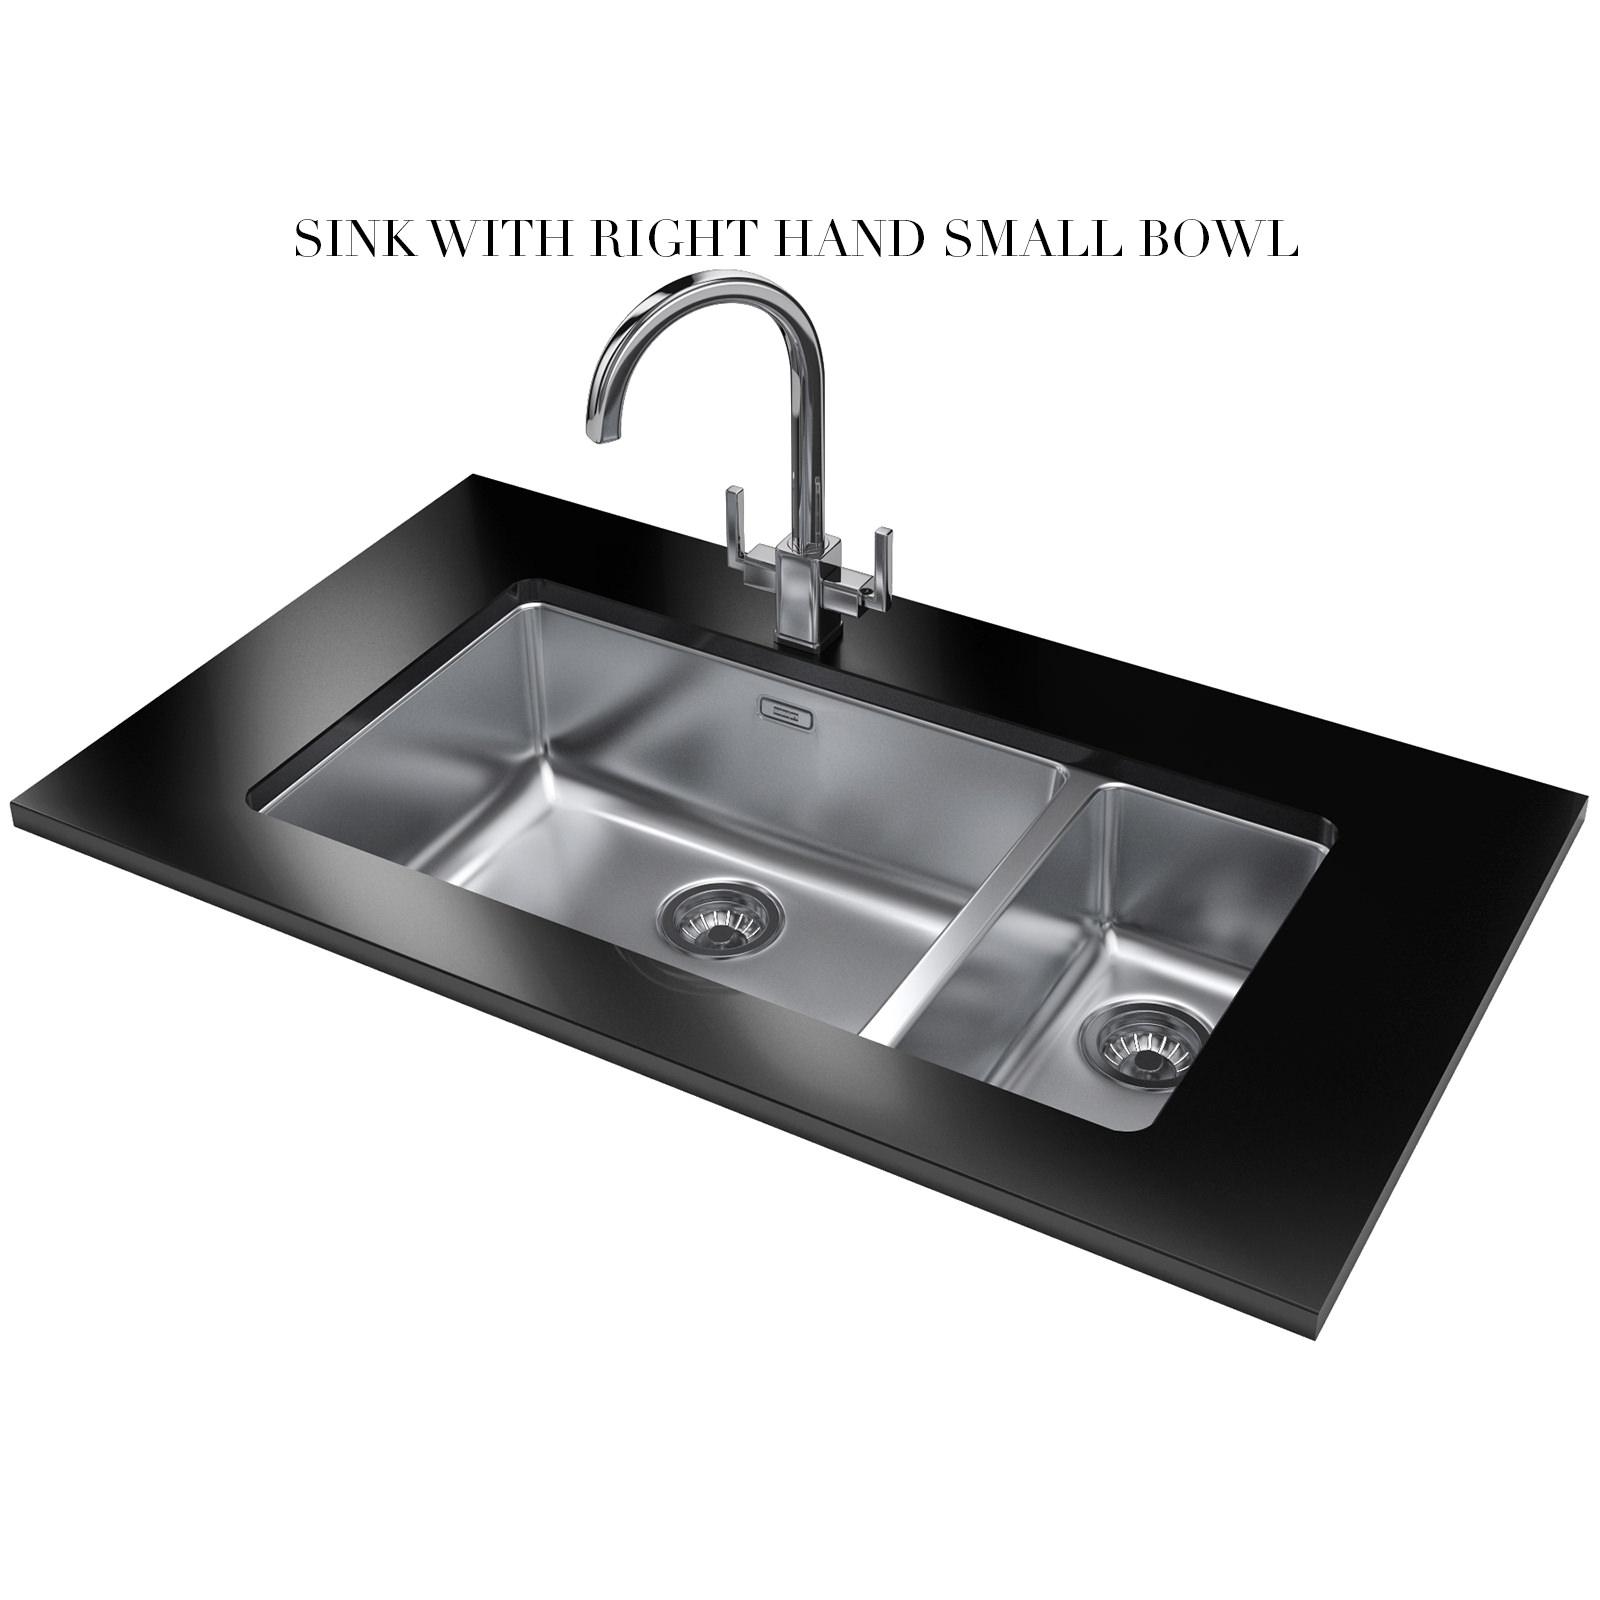 Best Price Franke Sinks : Franke kubus kbx 160 55 20 stainless steel 1 5 bowl undermount sink